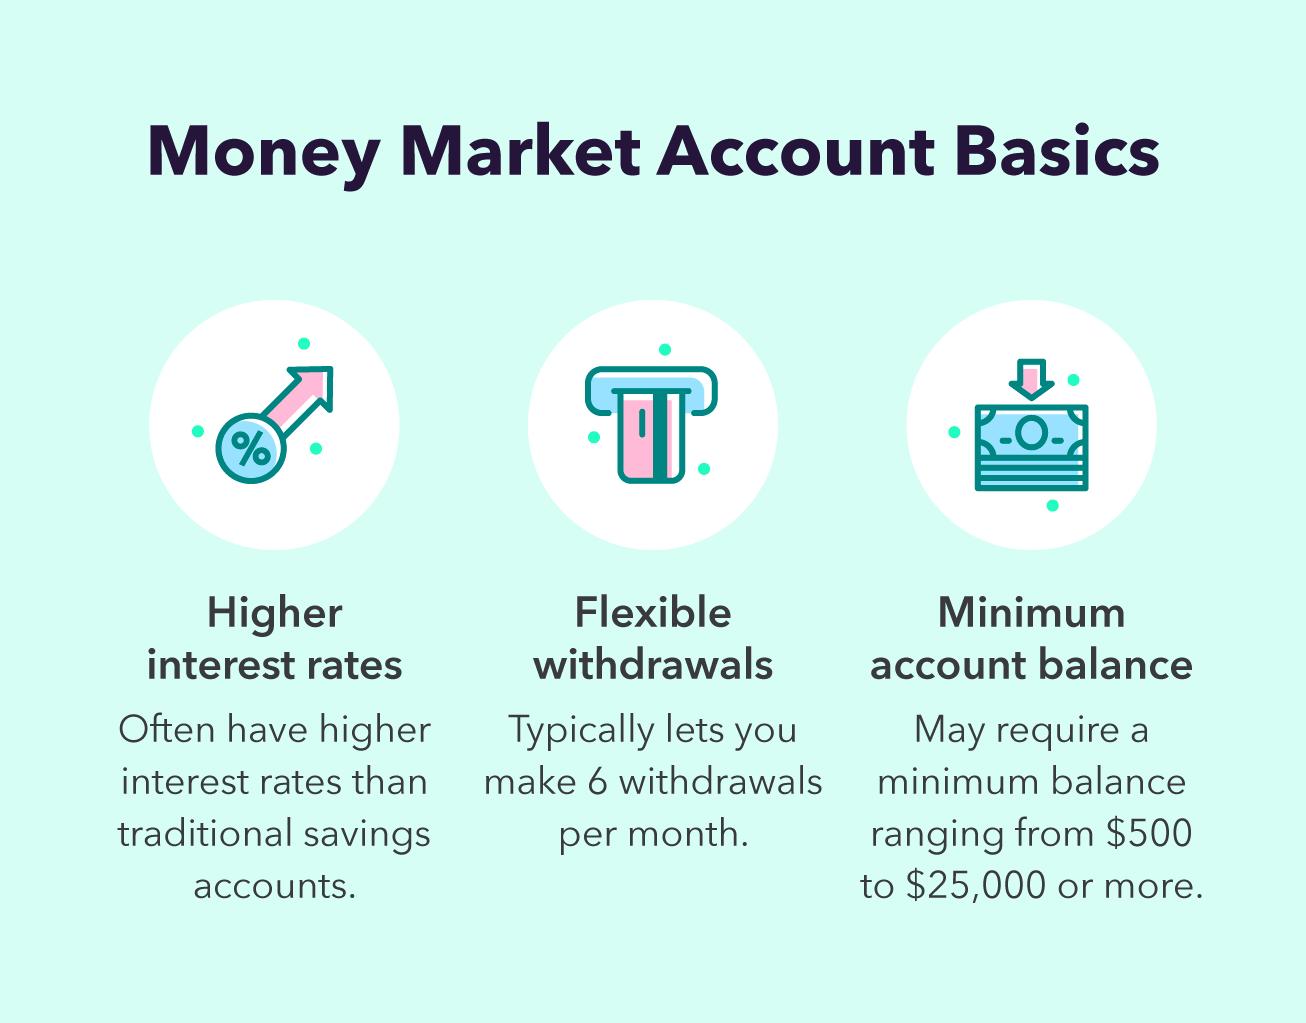 Money Market Account Basics